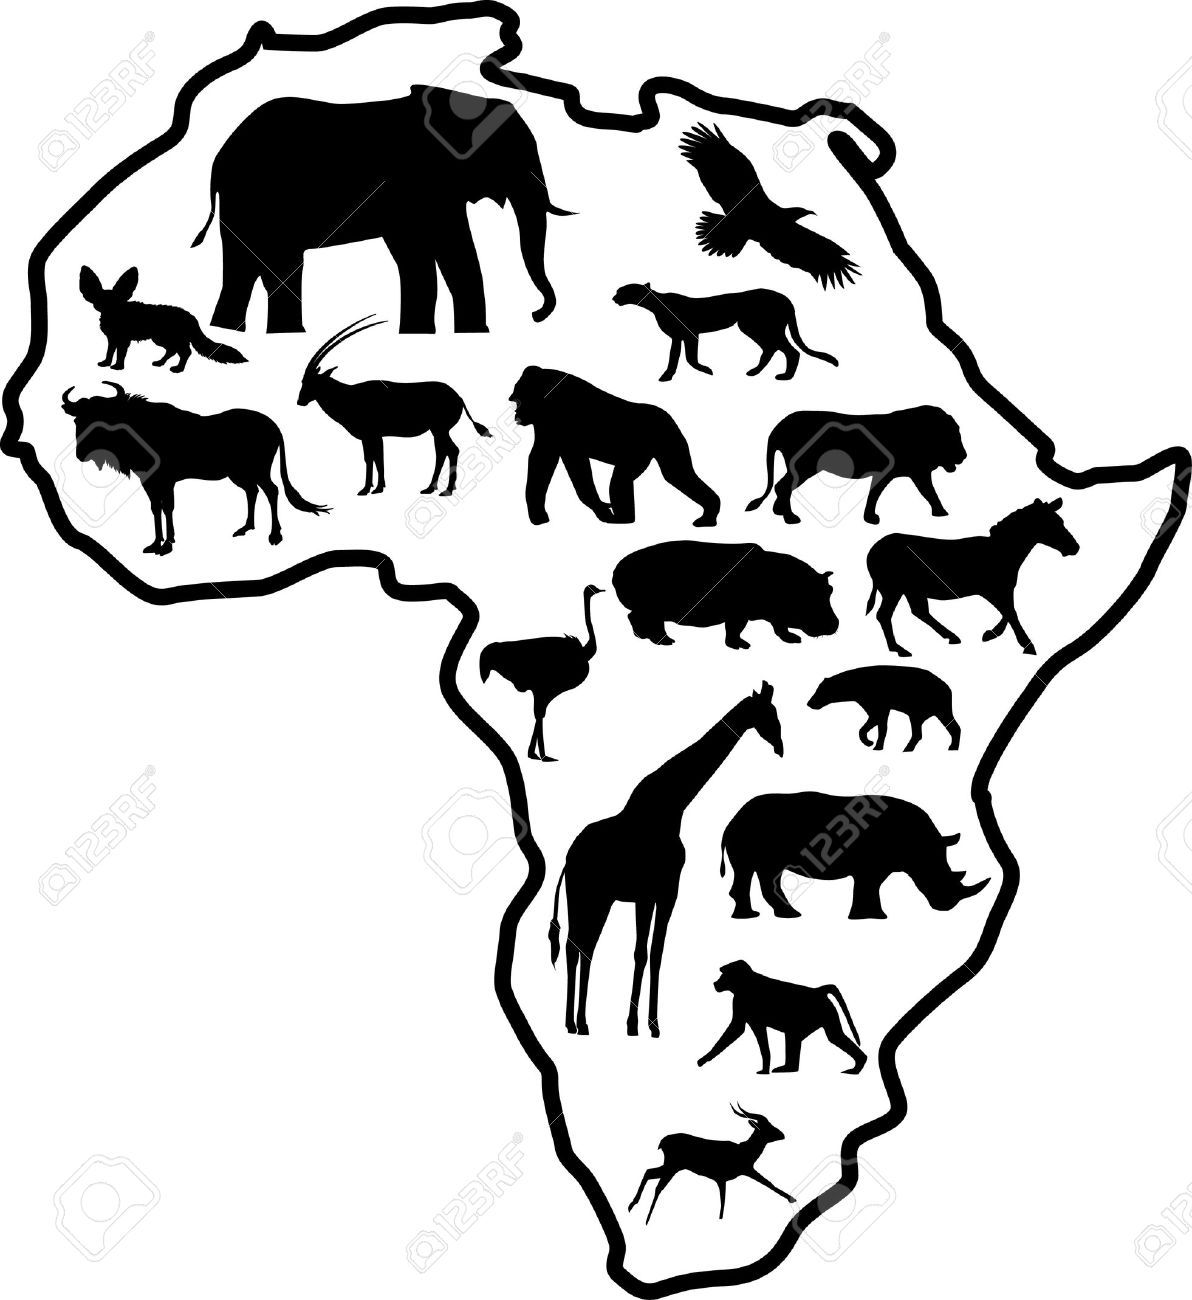 1192x1300 Africa Safari Animal Silhouette (Map) African Prints